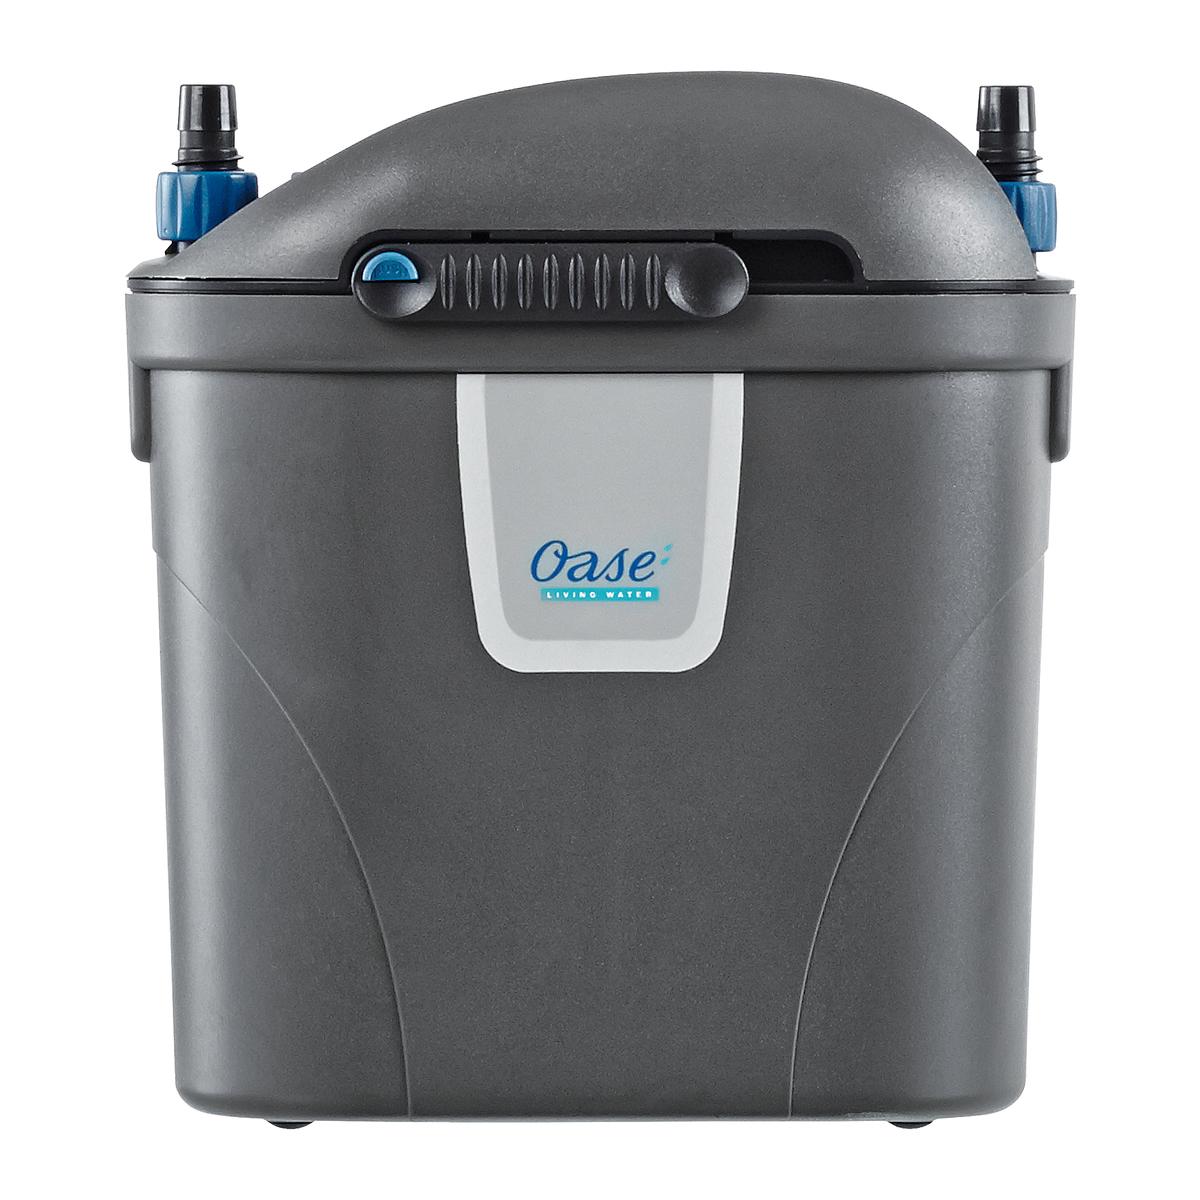 Oase FiltoSmart 60 Mini / Nano Canister filter 5W 300 L/H